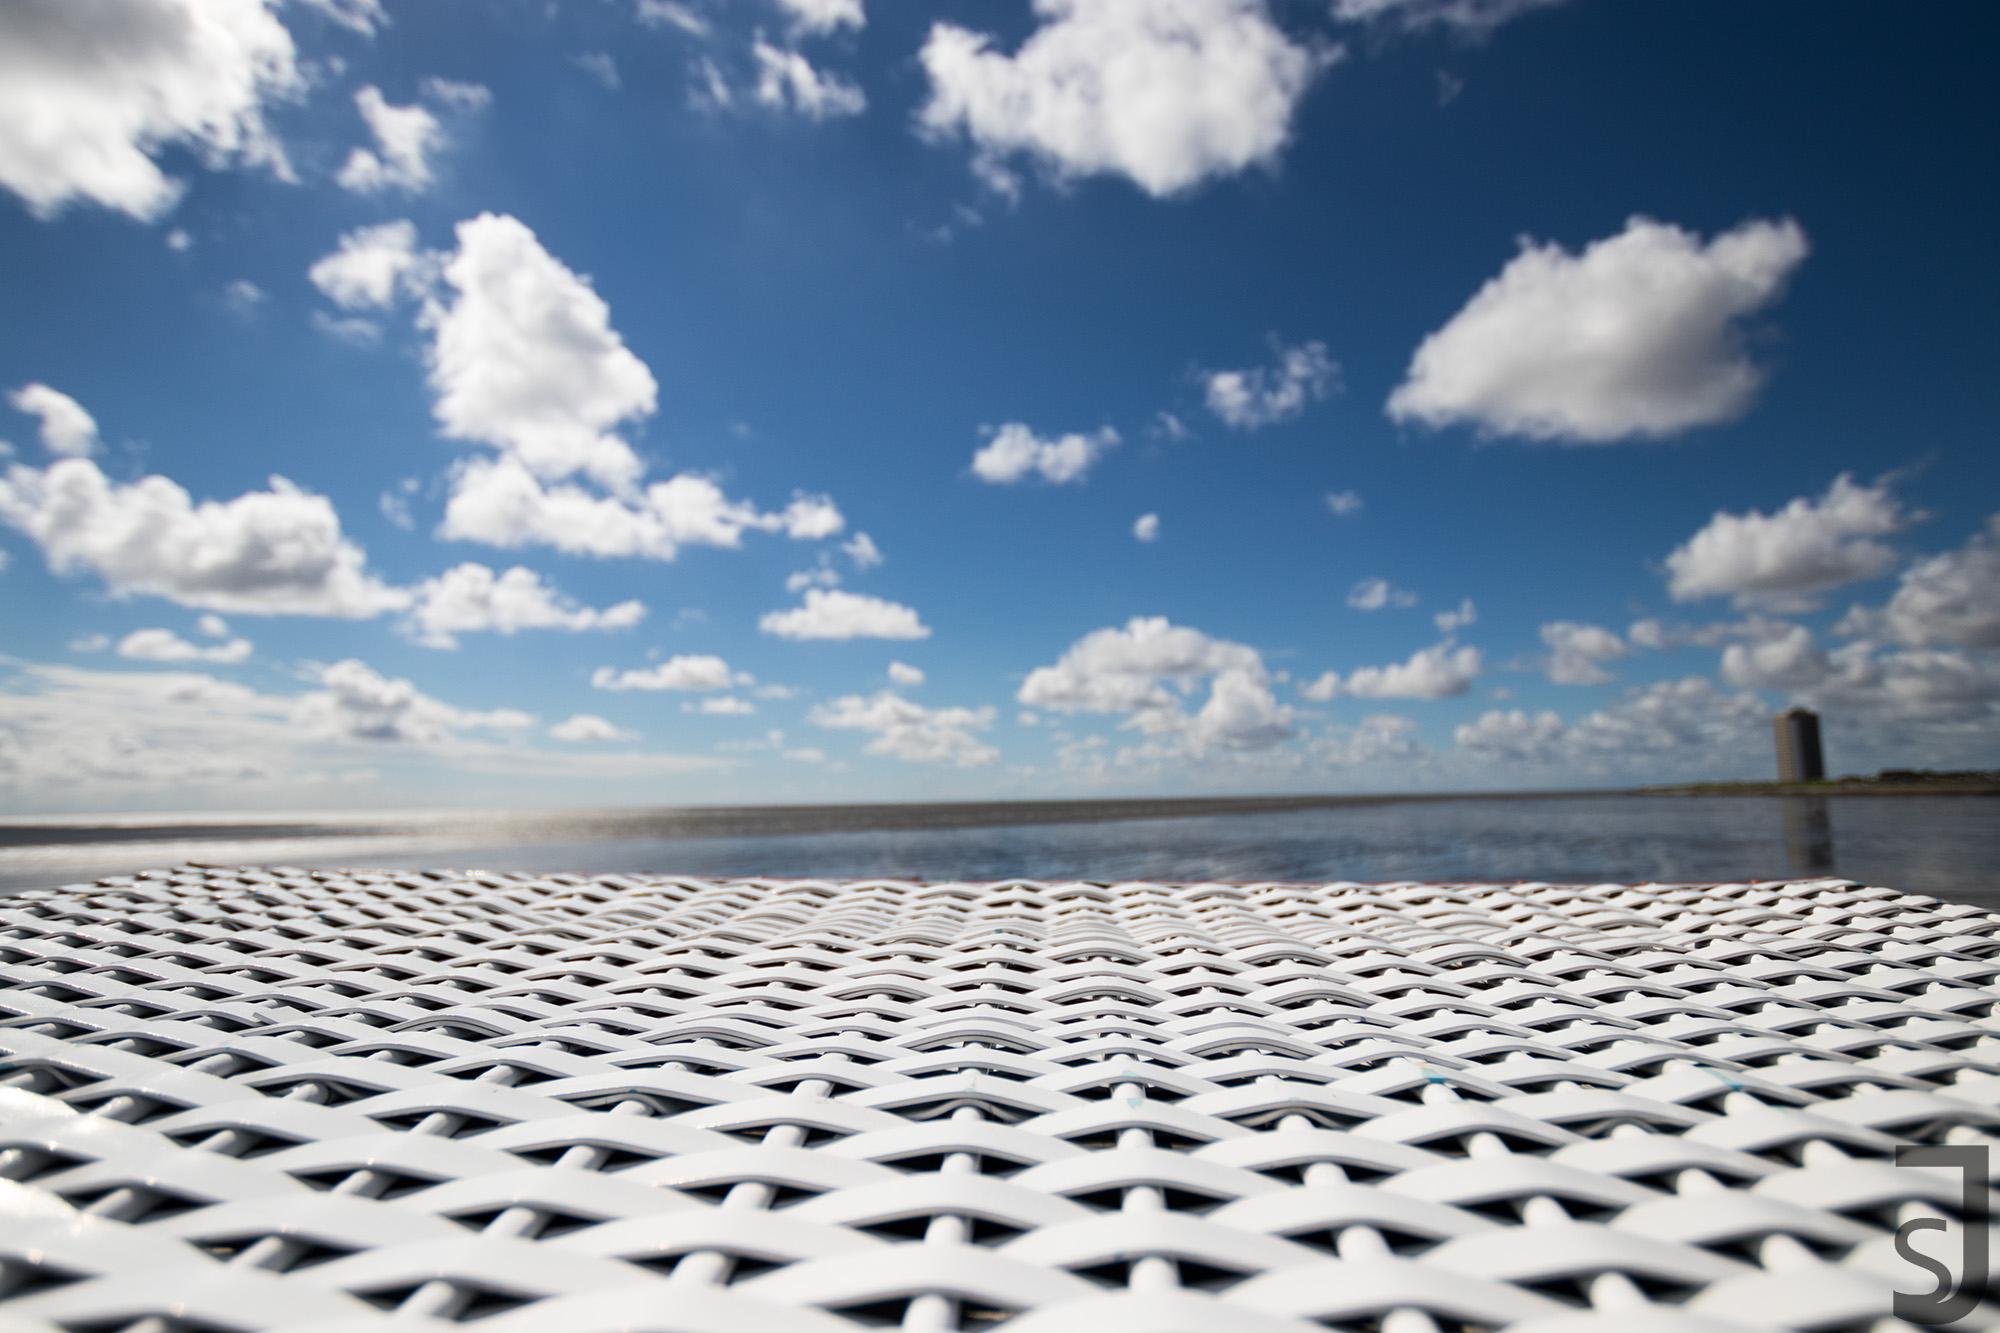 Strandkorb (Dach), Büsum